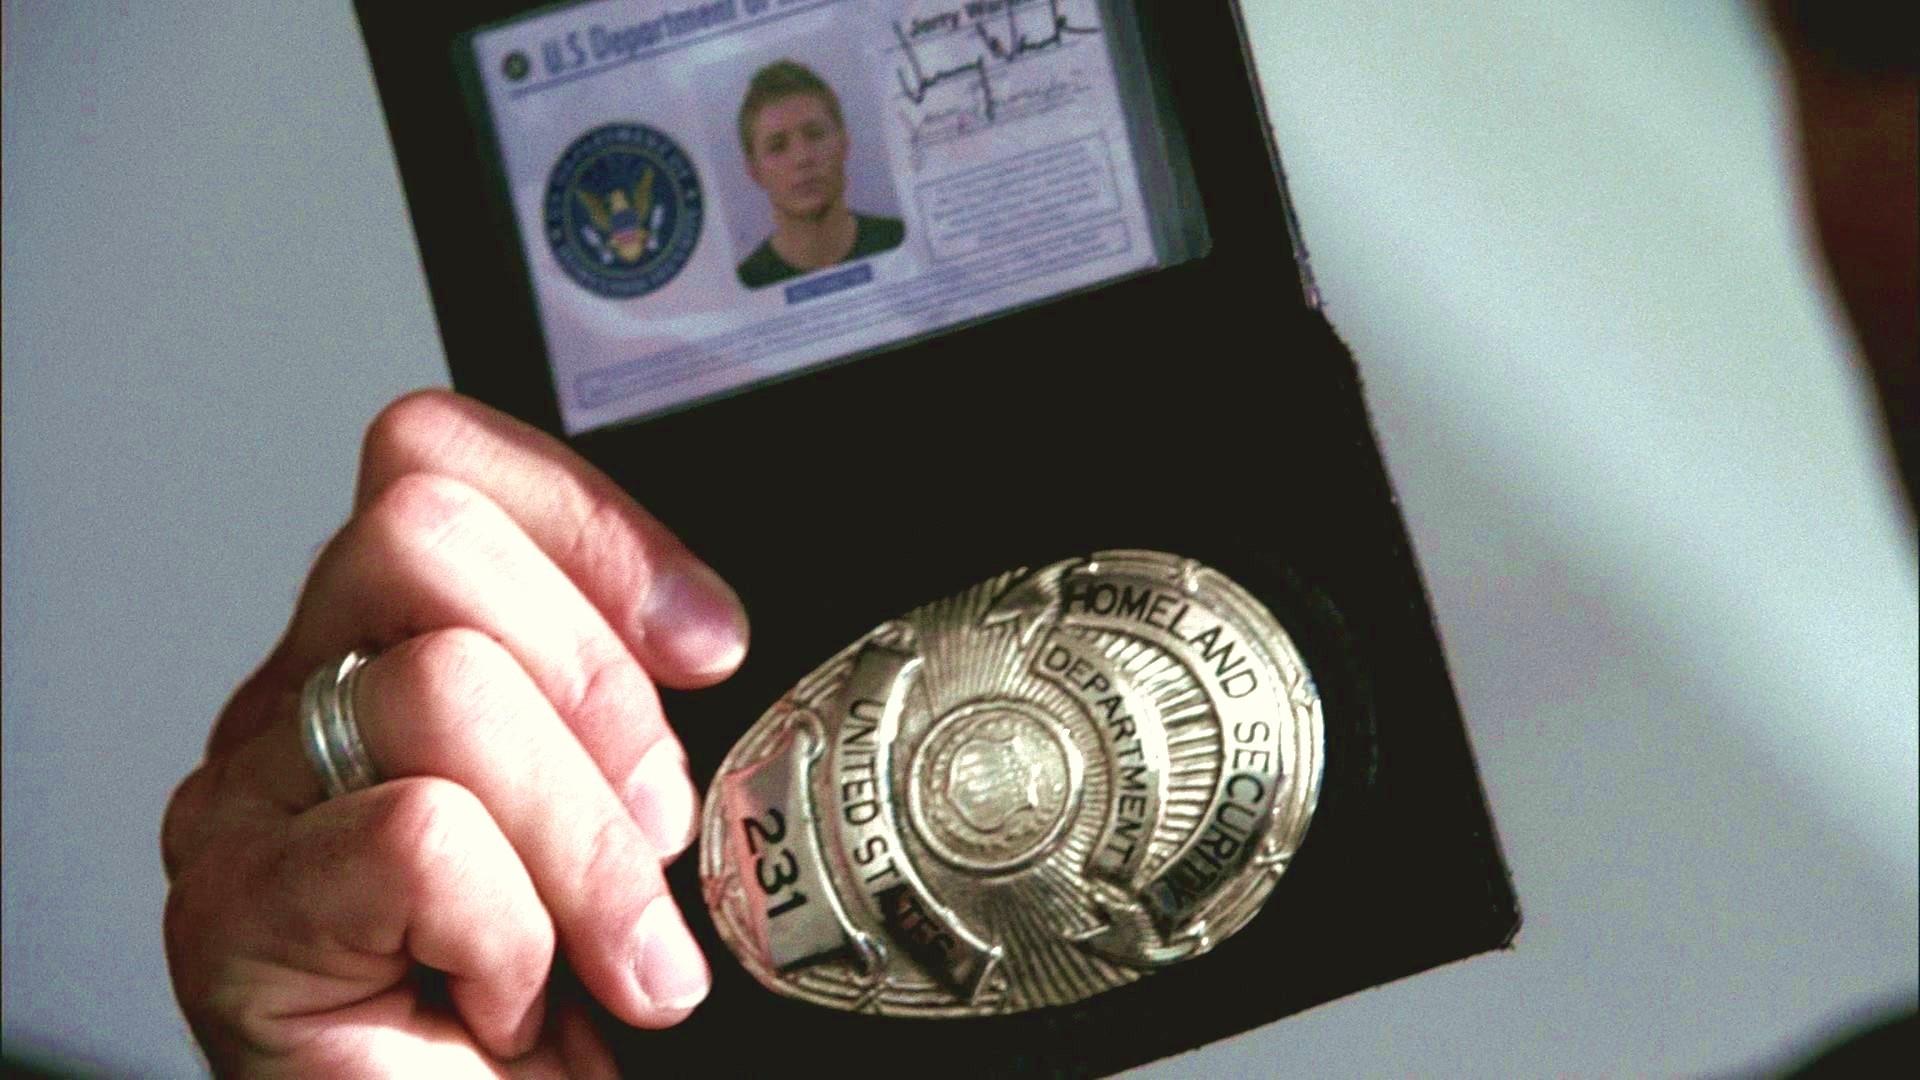 Fake Homeland Security Badge